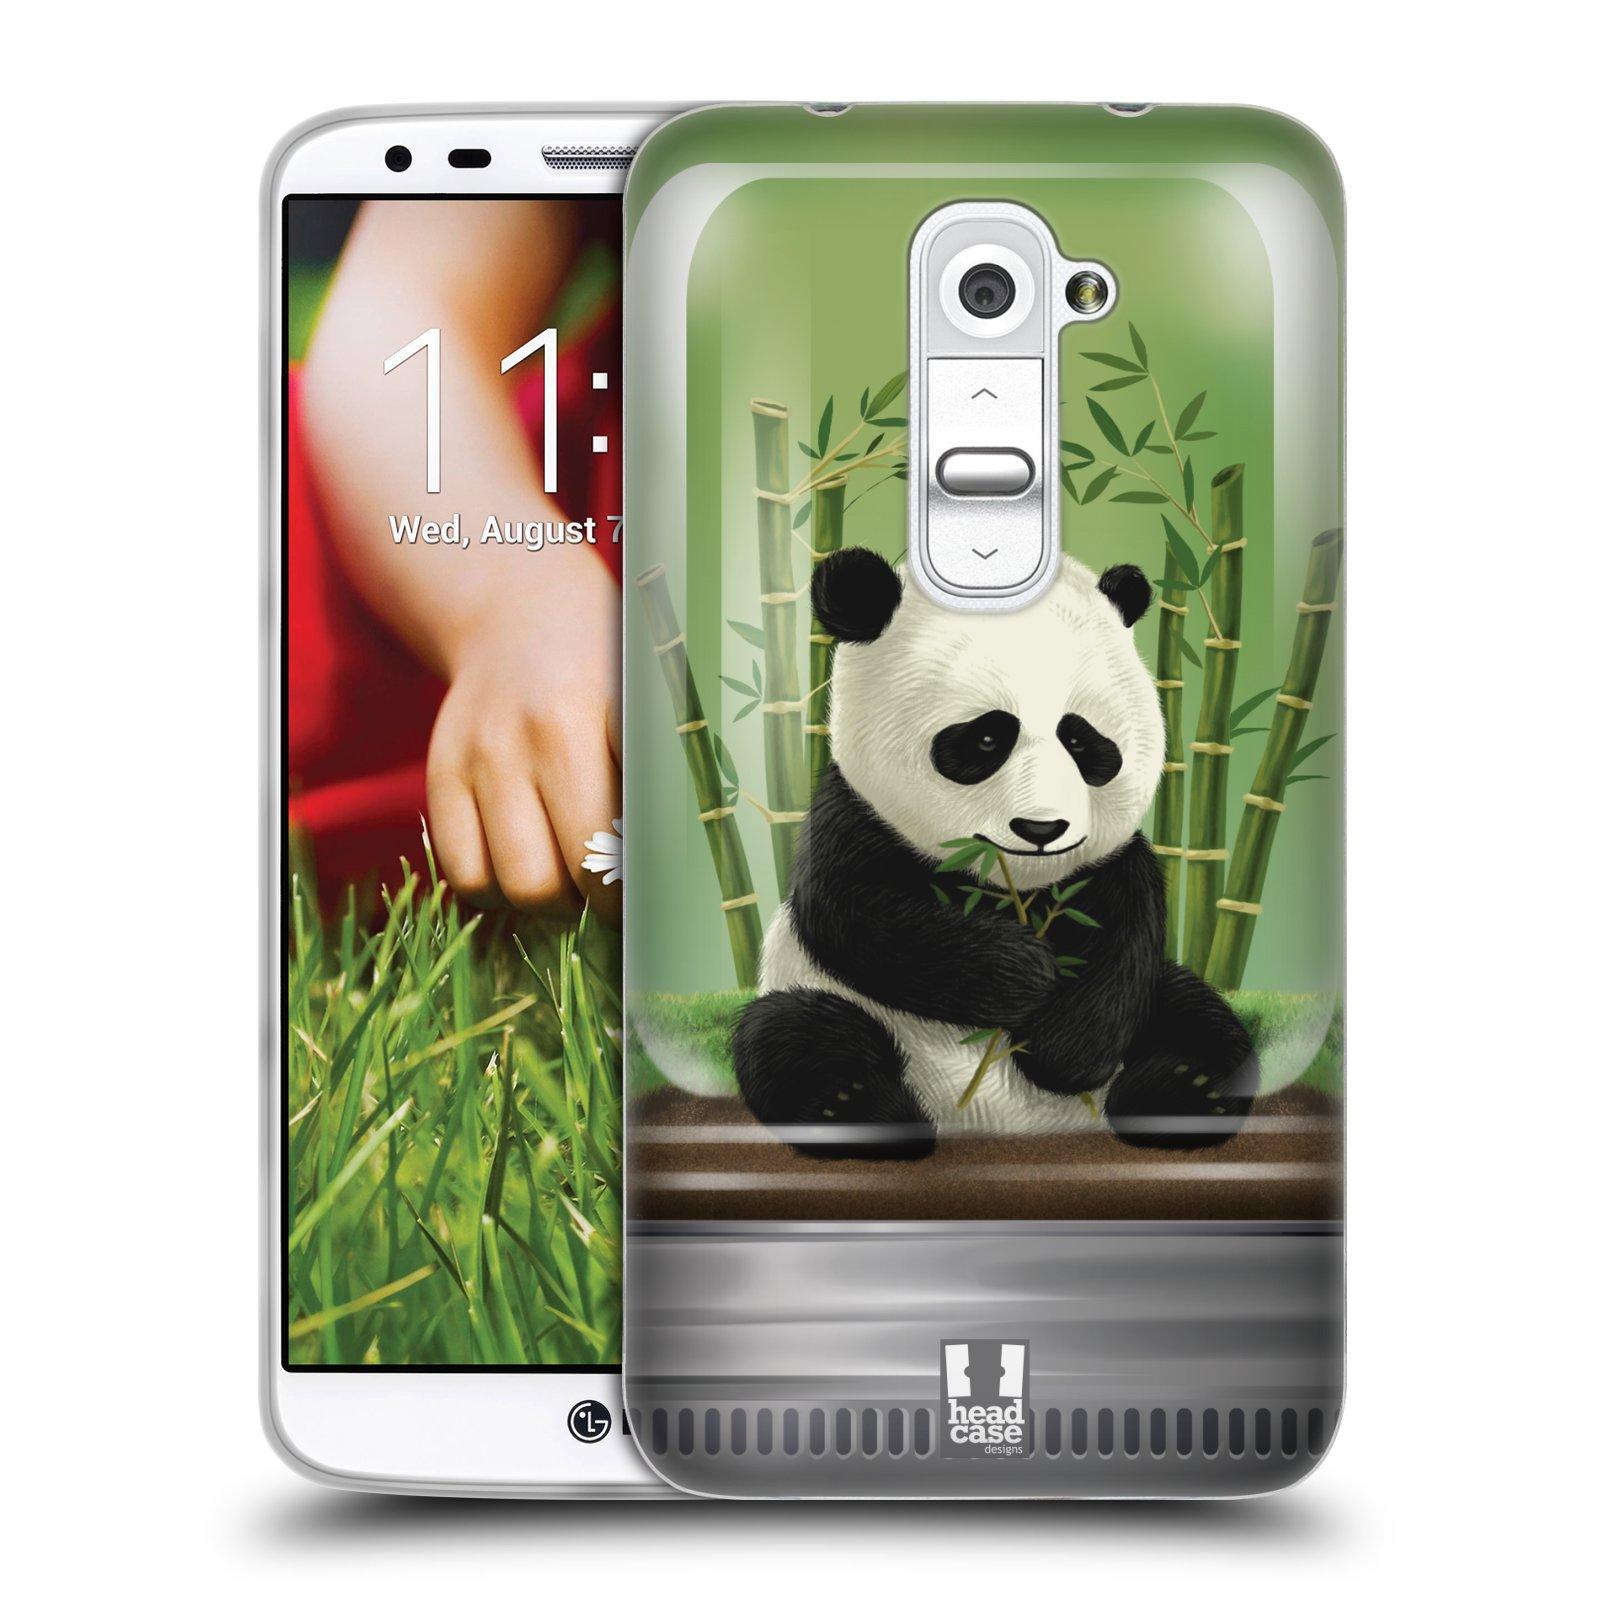 HEAD CASE silikonový obal na mobil LG G2 vzor Zvířátka v těžítku panda